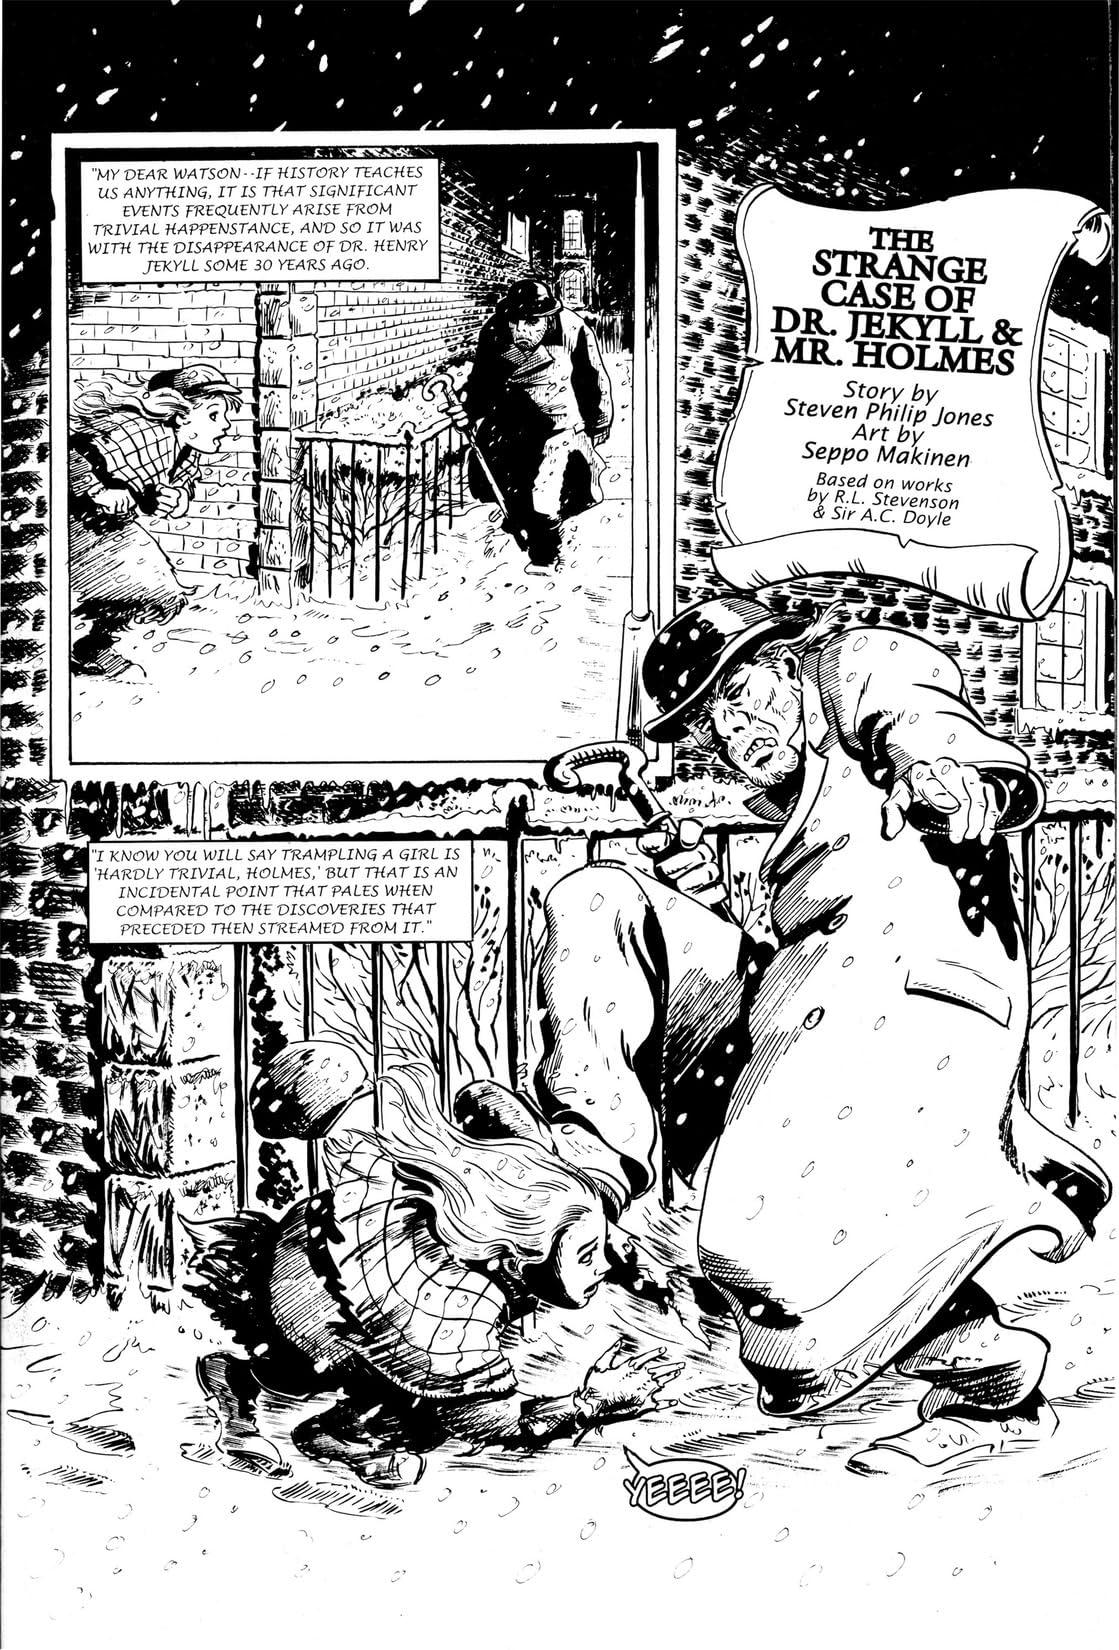 Sherlock Holmes: Dr. Jekyll & Mr. Holmes